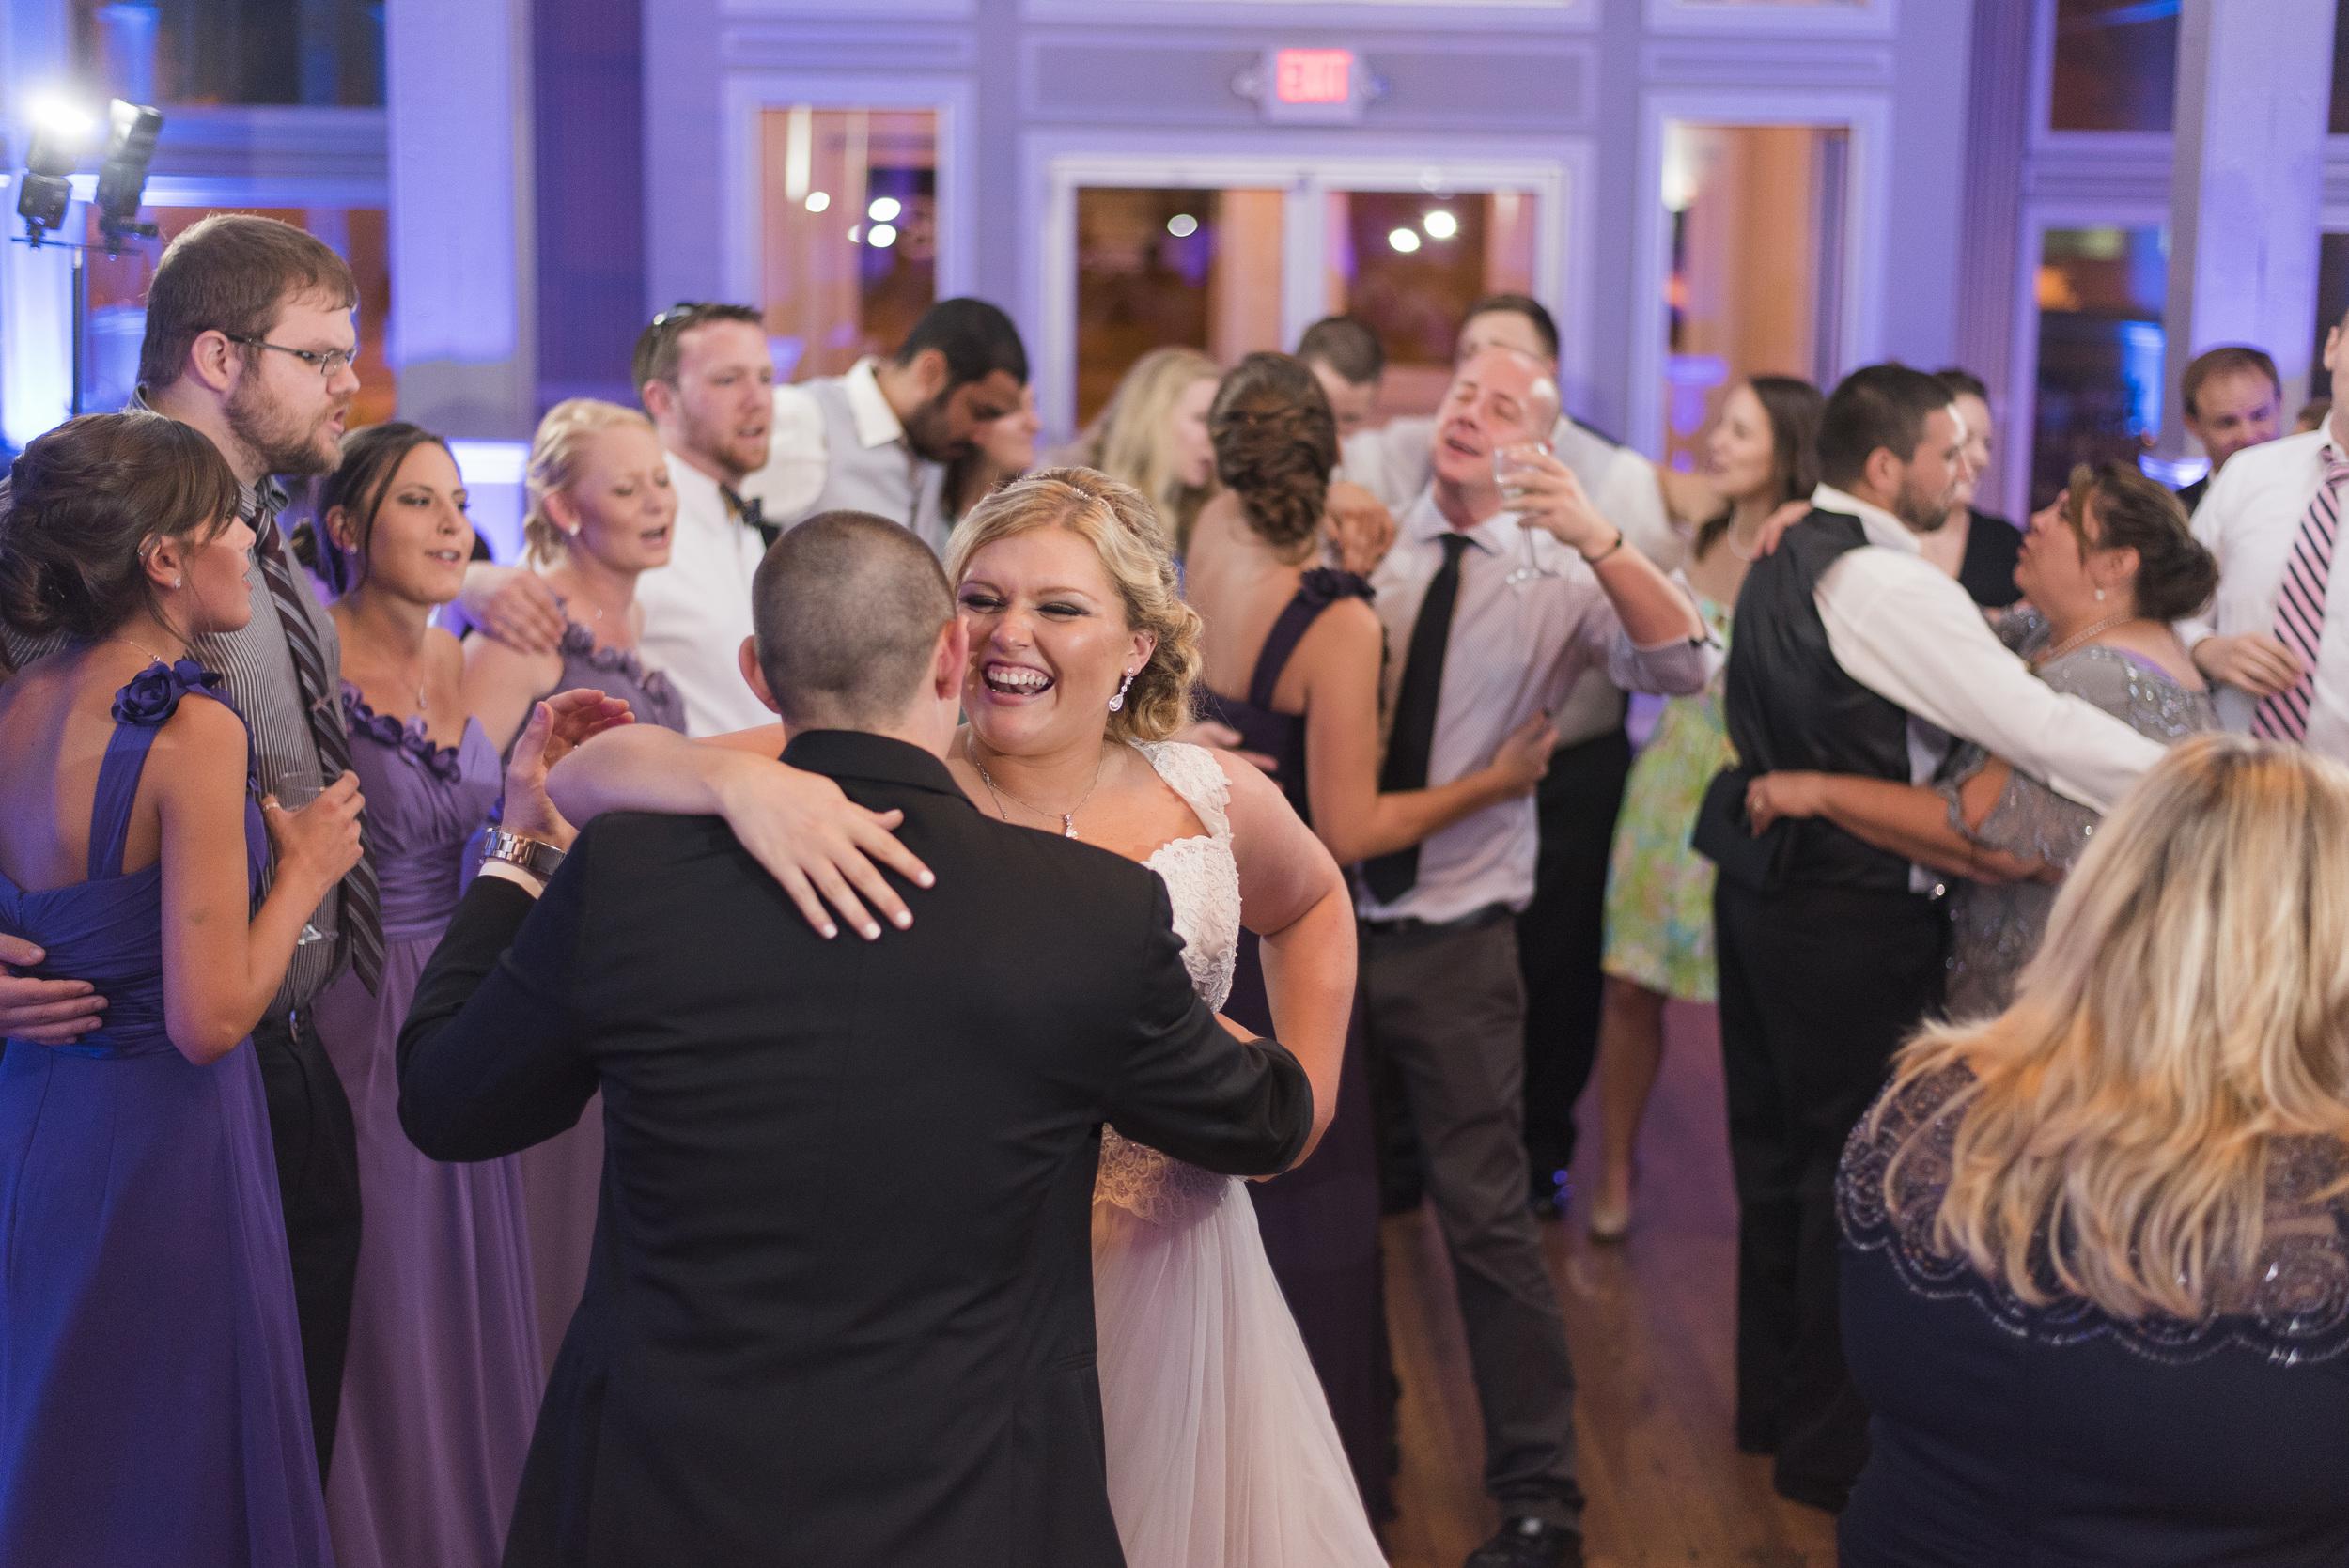 Lynchburg_VA_Wedding_Tresca on 8th_Downtown_Purple_elegant_Photos931.jpg